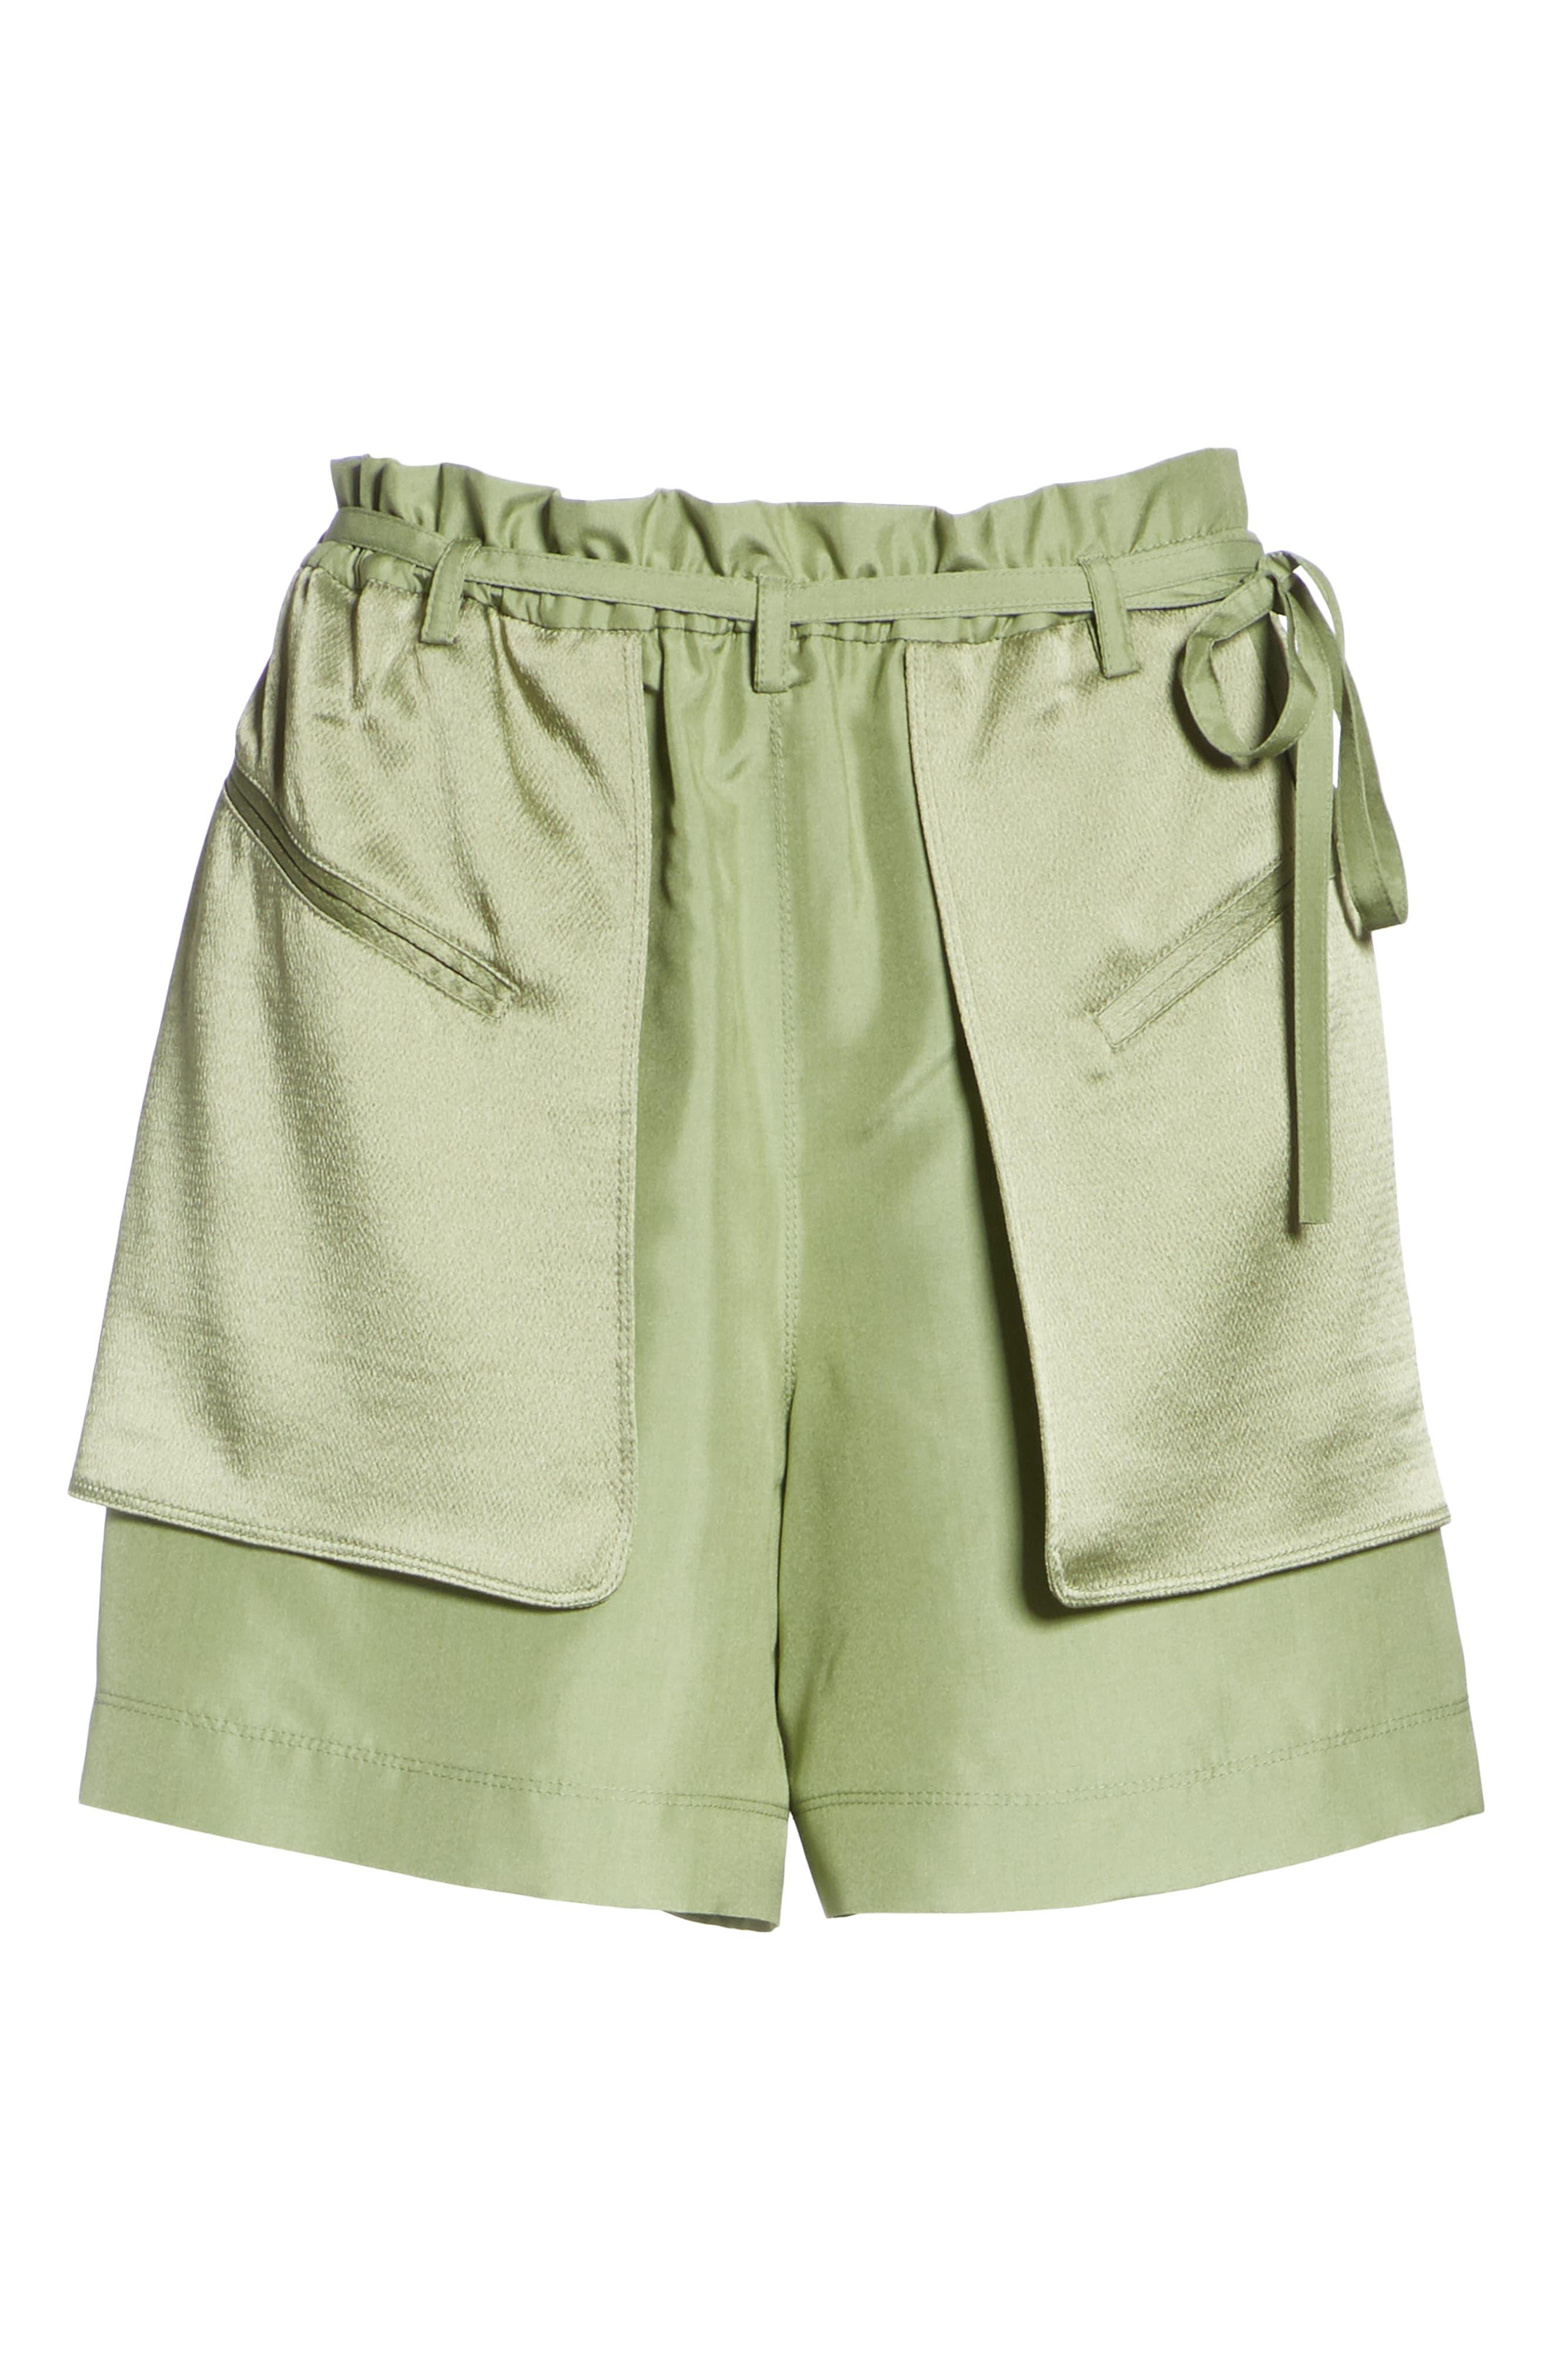 Satin Pocket Shorts,                             Alternate thumbnail 6, color,                             300